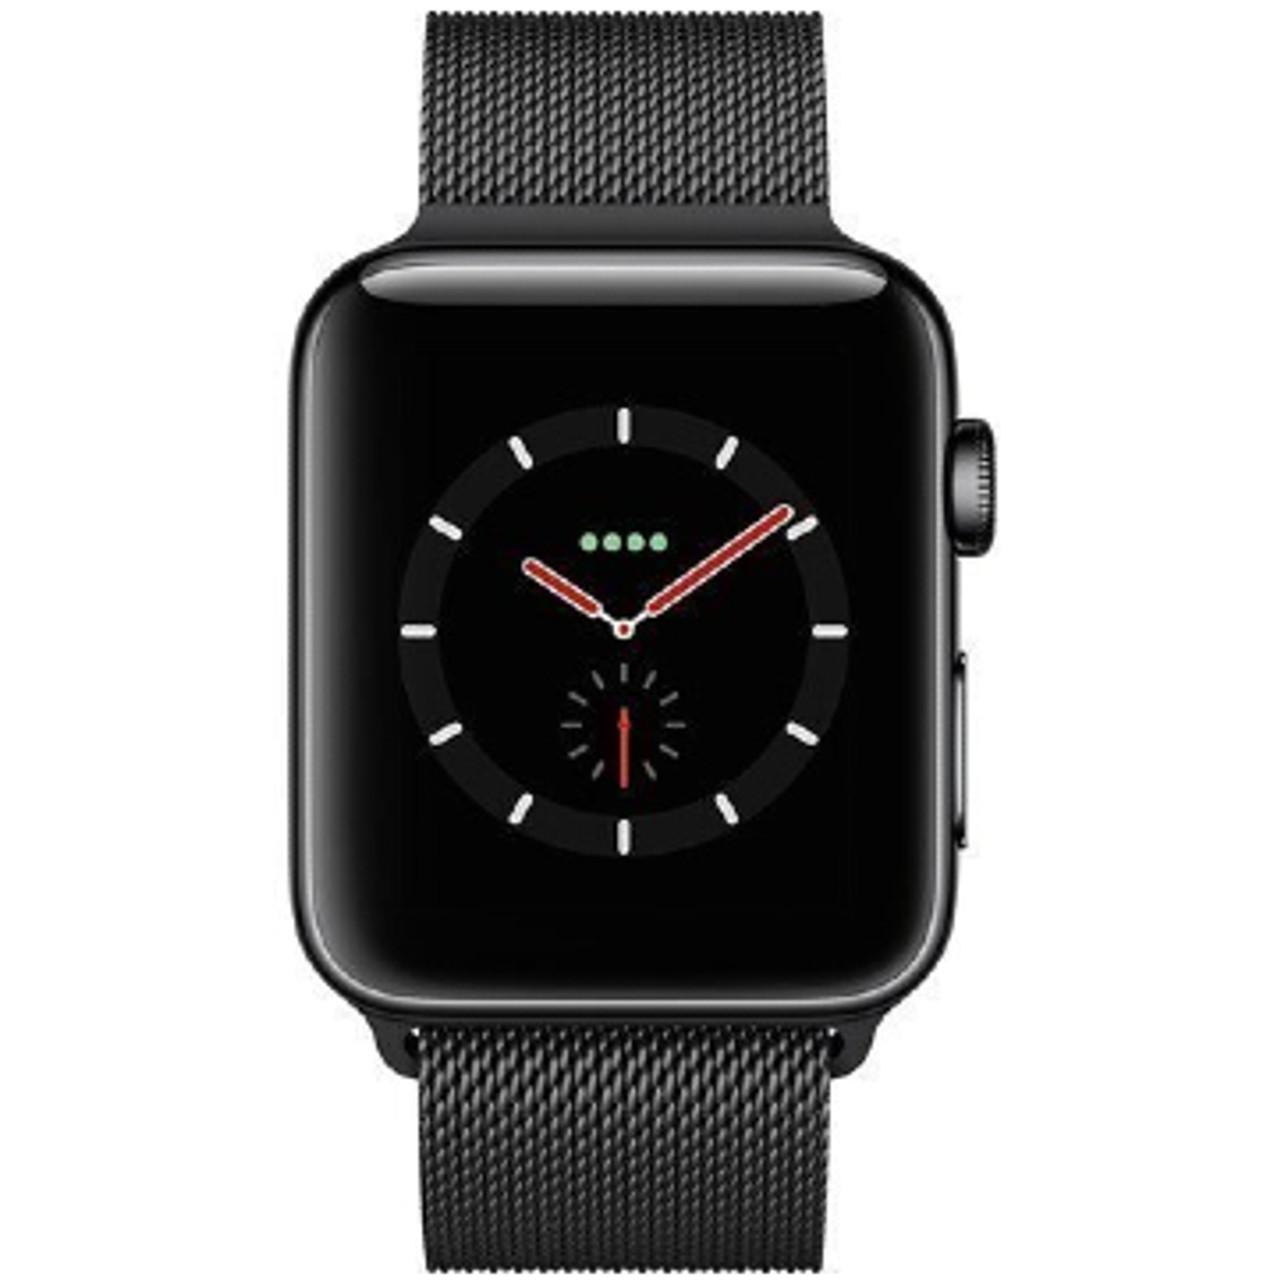 Persona a cargo por otra parte, frio  Apple Watch Nike + (Series 2) - 42mm Space Gray | mac of all trades